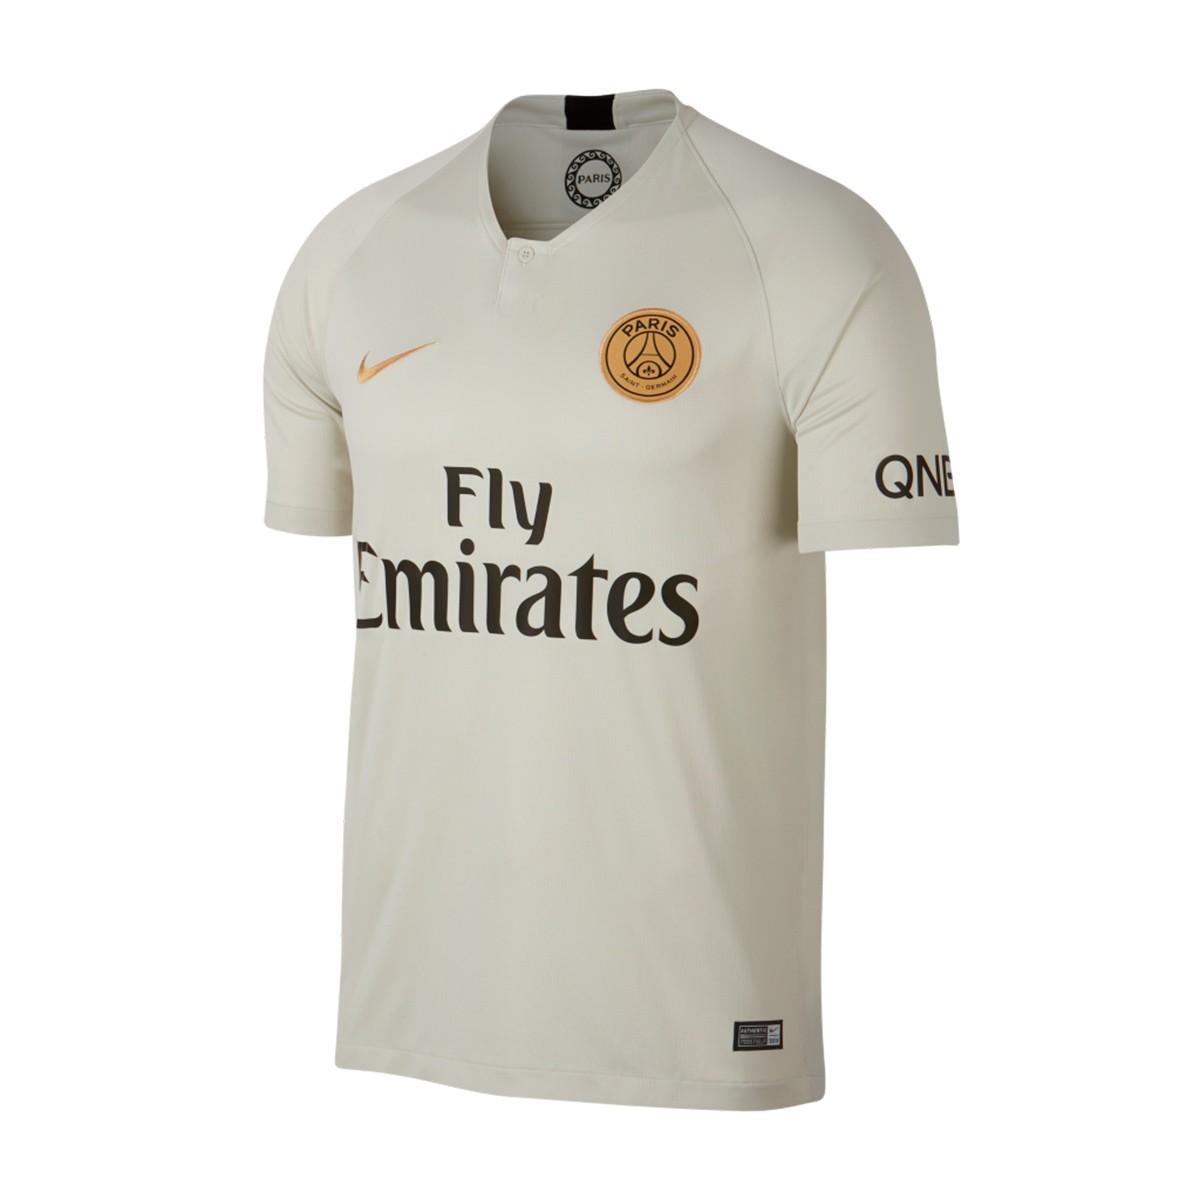 new style 236f9 473a6 Jersey Nike Paris Saint-Germain Stadium 2018-2019 Away Light bone-Truly  gold - Football store Fútbol Emotion